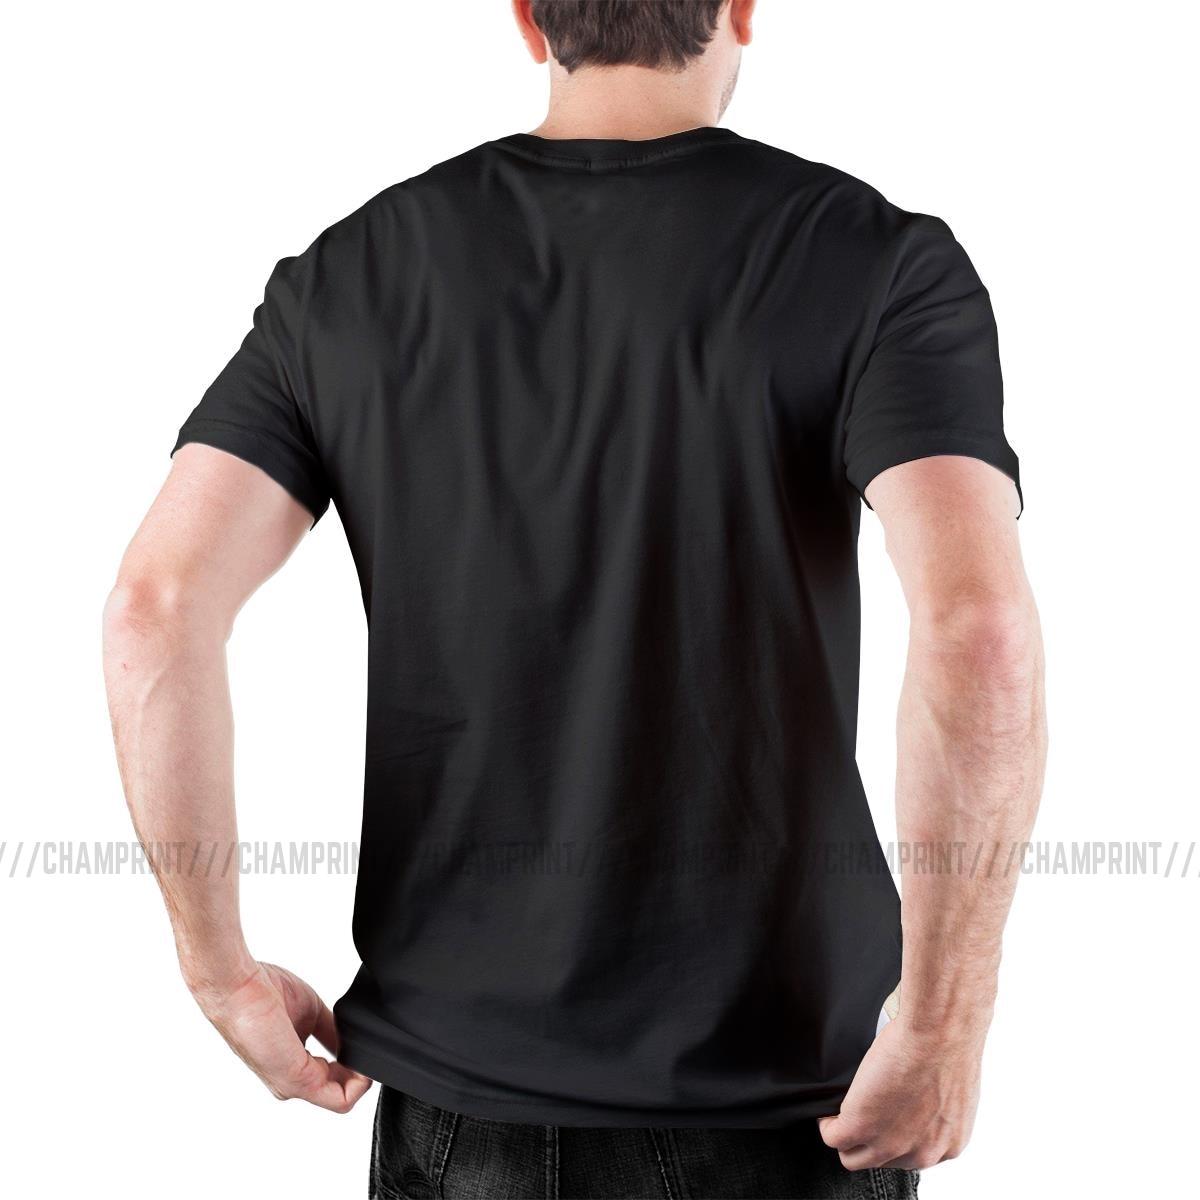 Ghost Gengar T-Shirts for Men Kaiju Japan Pokemon Pocket Monster Cartoon Cotton Tee Shirt Short Sleeve T Shirt Party Tops 2